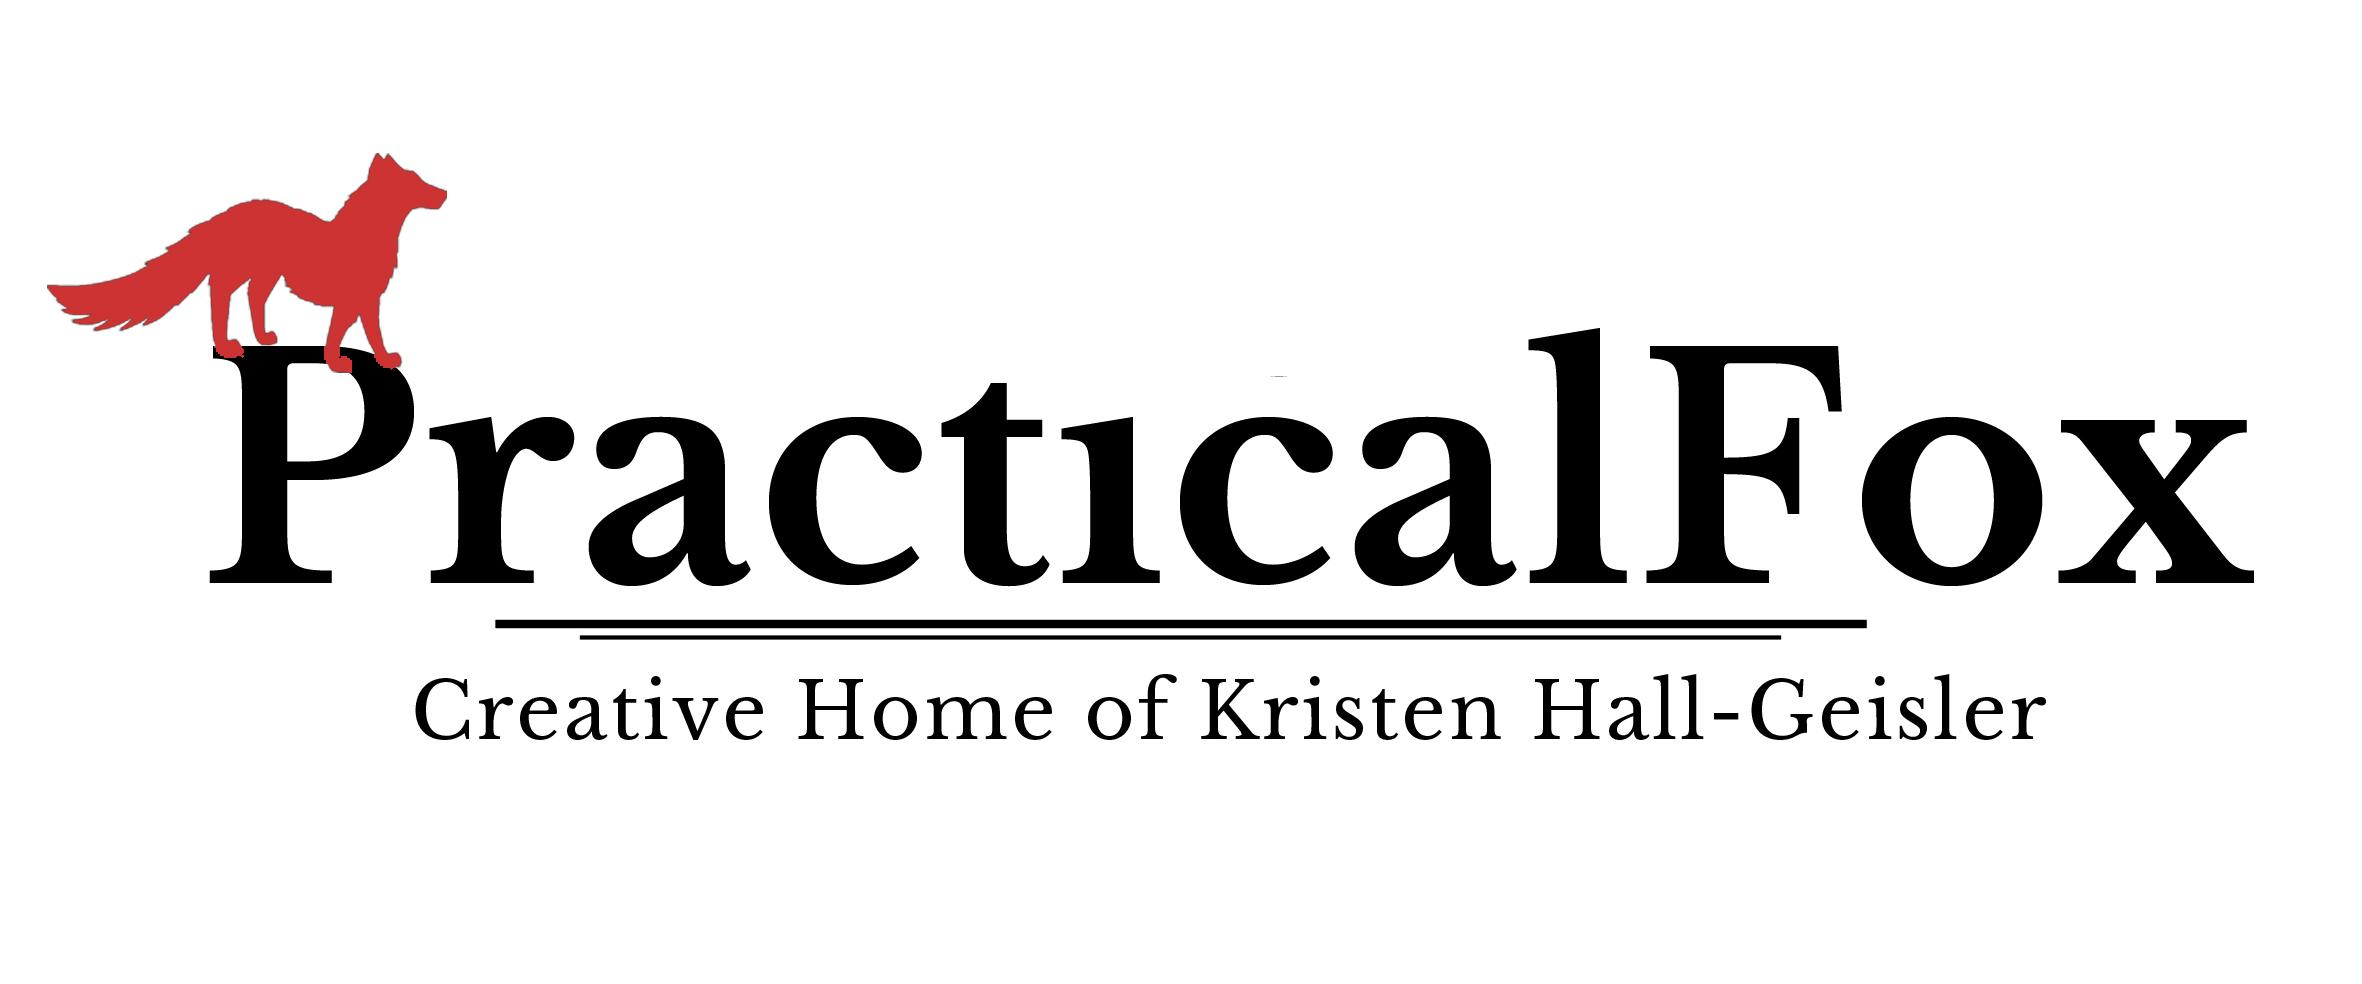 Kristen Hall-Geisler